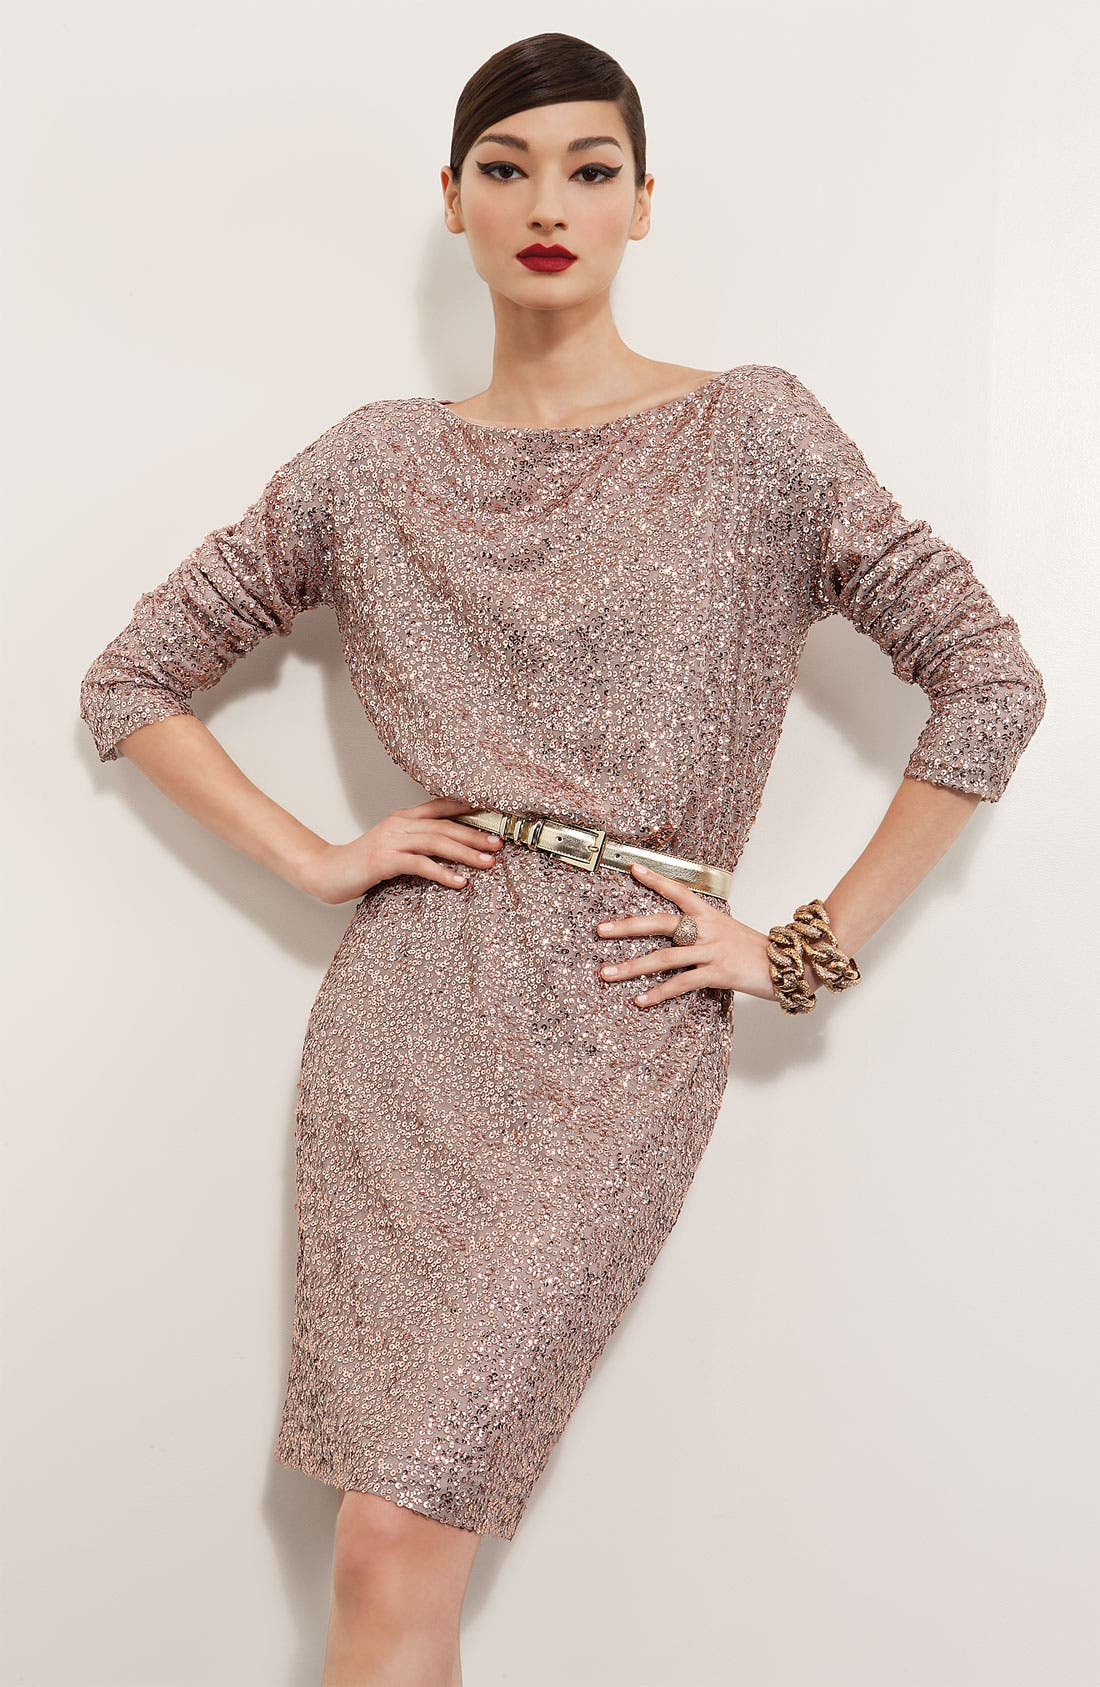 Main Image - St. John Collection Dress & Jewelry